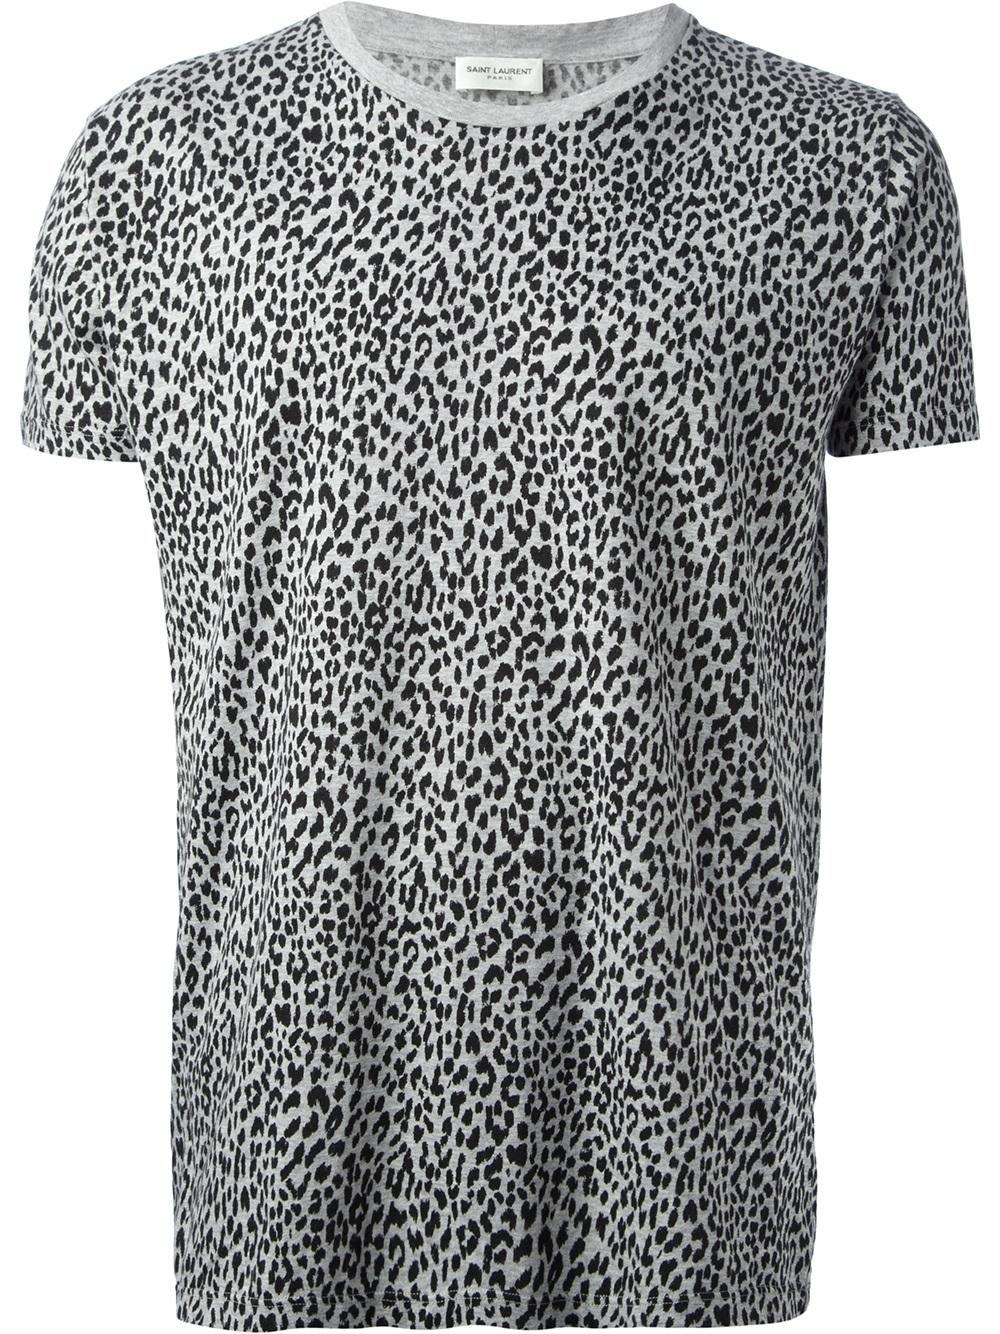 Saint laurent leopard print t shirt in gray for men lyst for Saint laurent t shirt